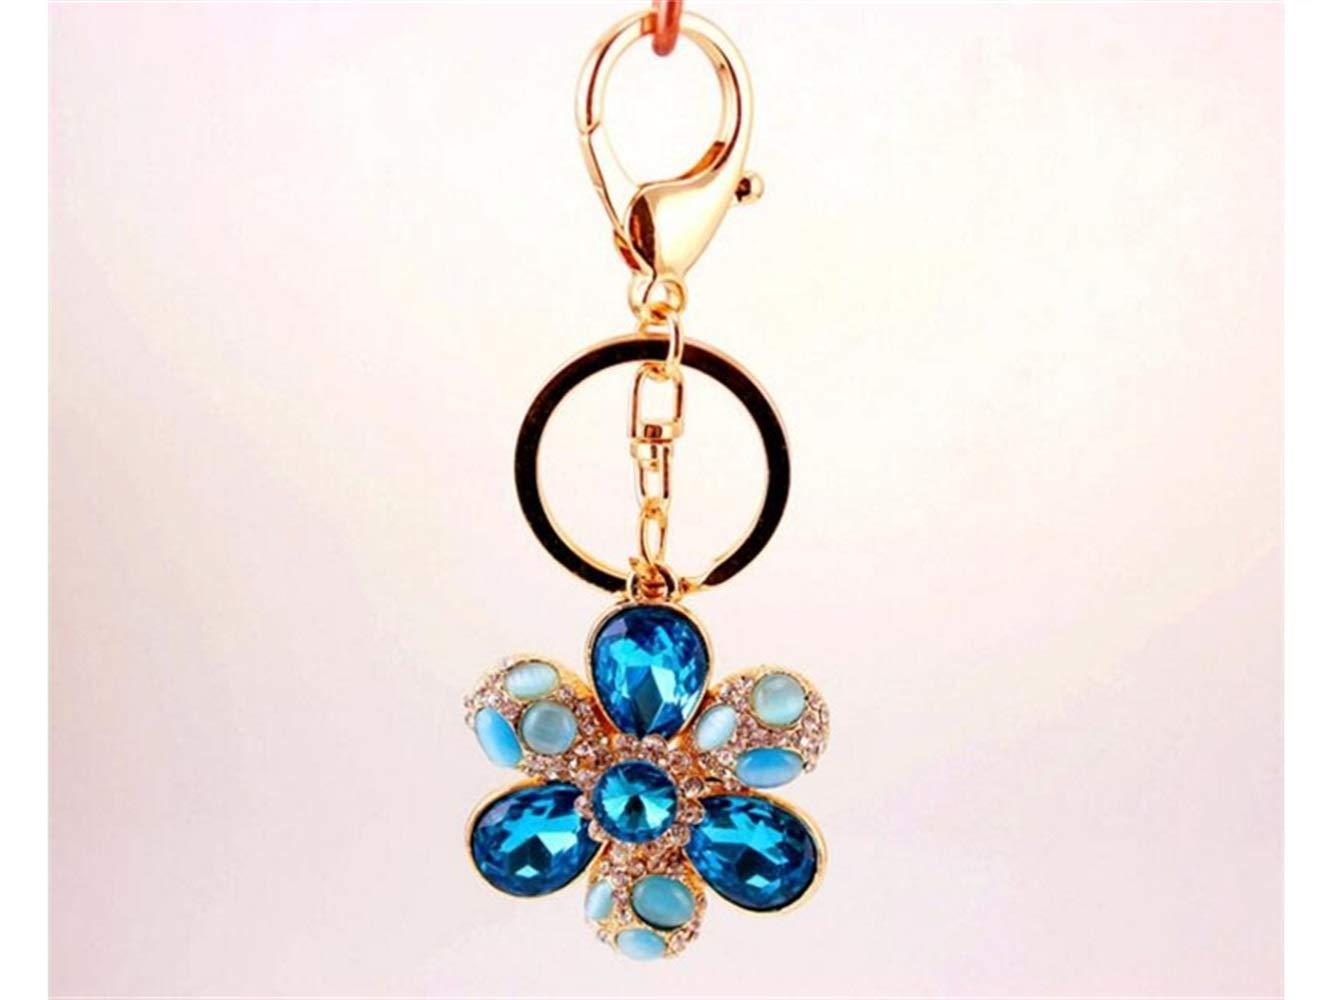 Gelaiken Novelty Diamond Opal Six-Petal Flower Keyring Crystal Keychain Charms Bag Purse Phone Pendant for Women Girls_Blue